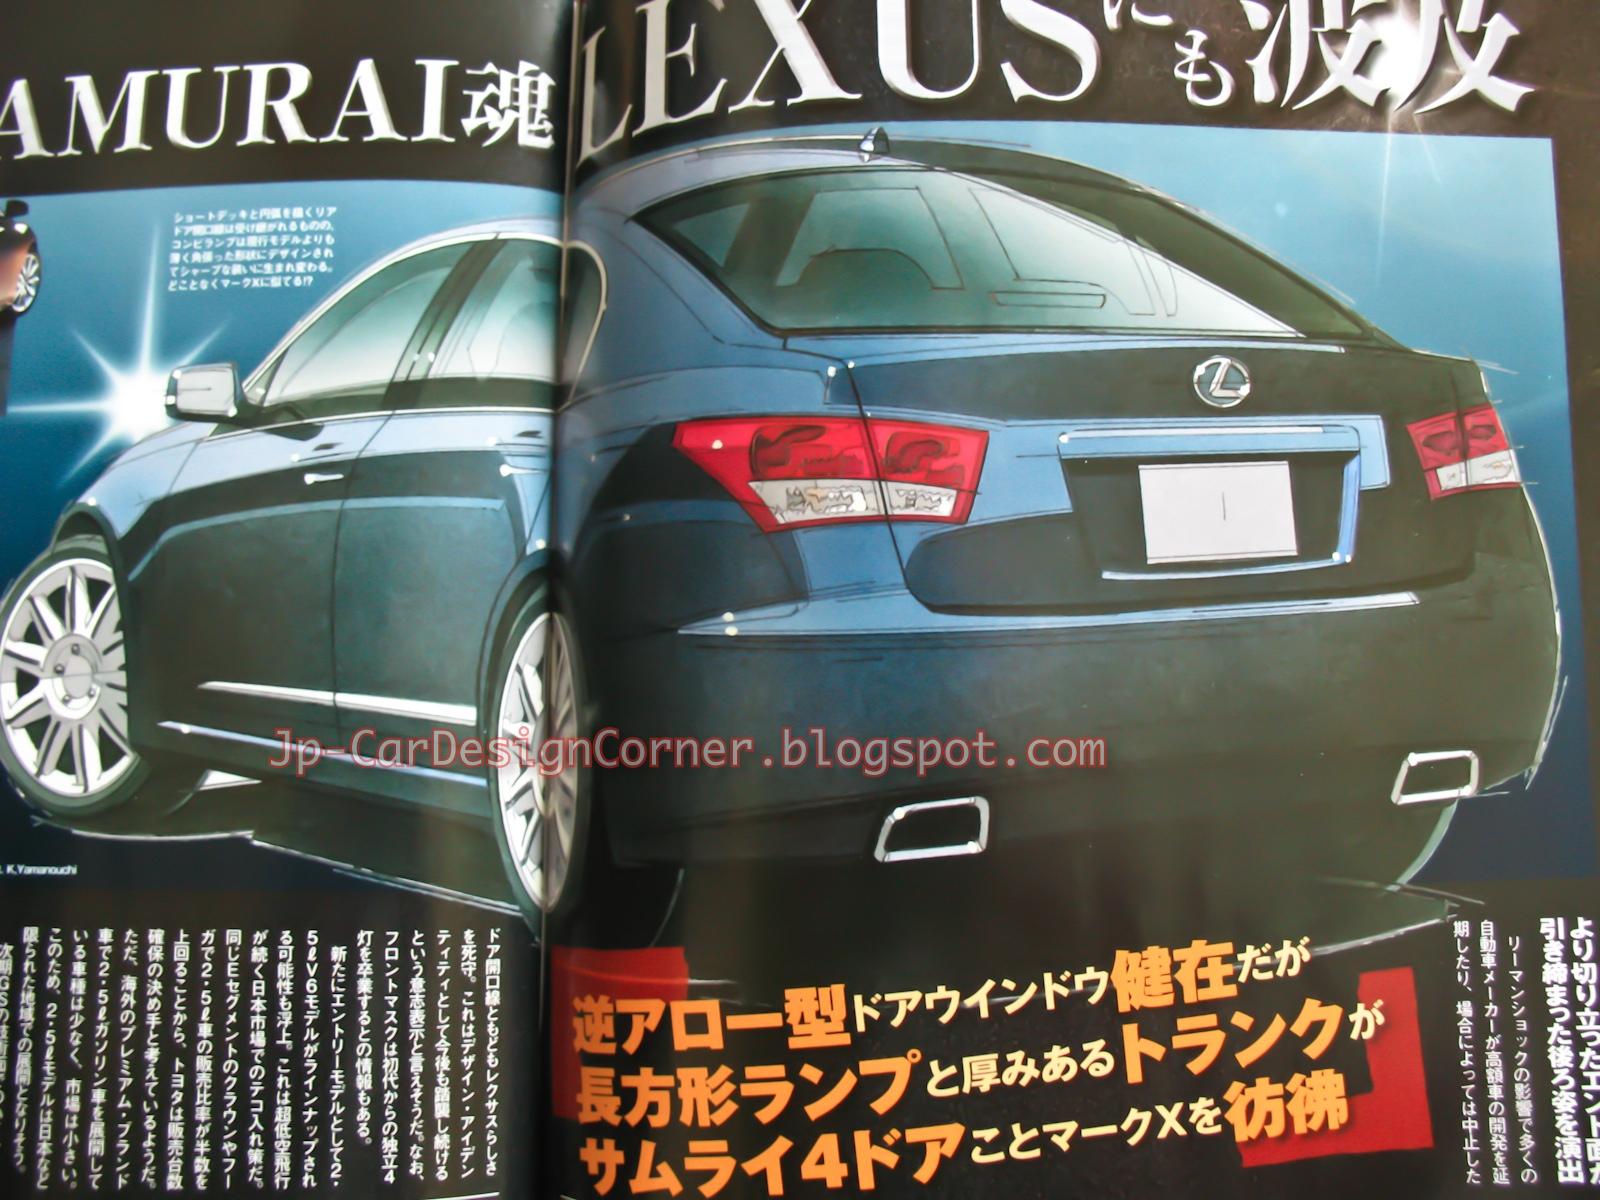 Lexus lf gh concept 2011 exterior detail 49 of 49 1600x1200 - Latest Impression Of New 2012 Lexus Gs